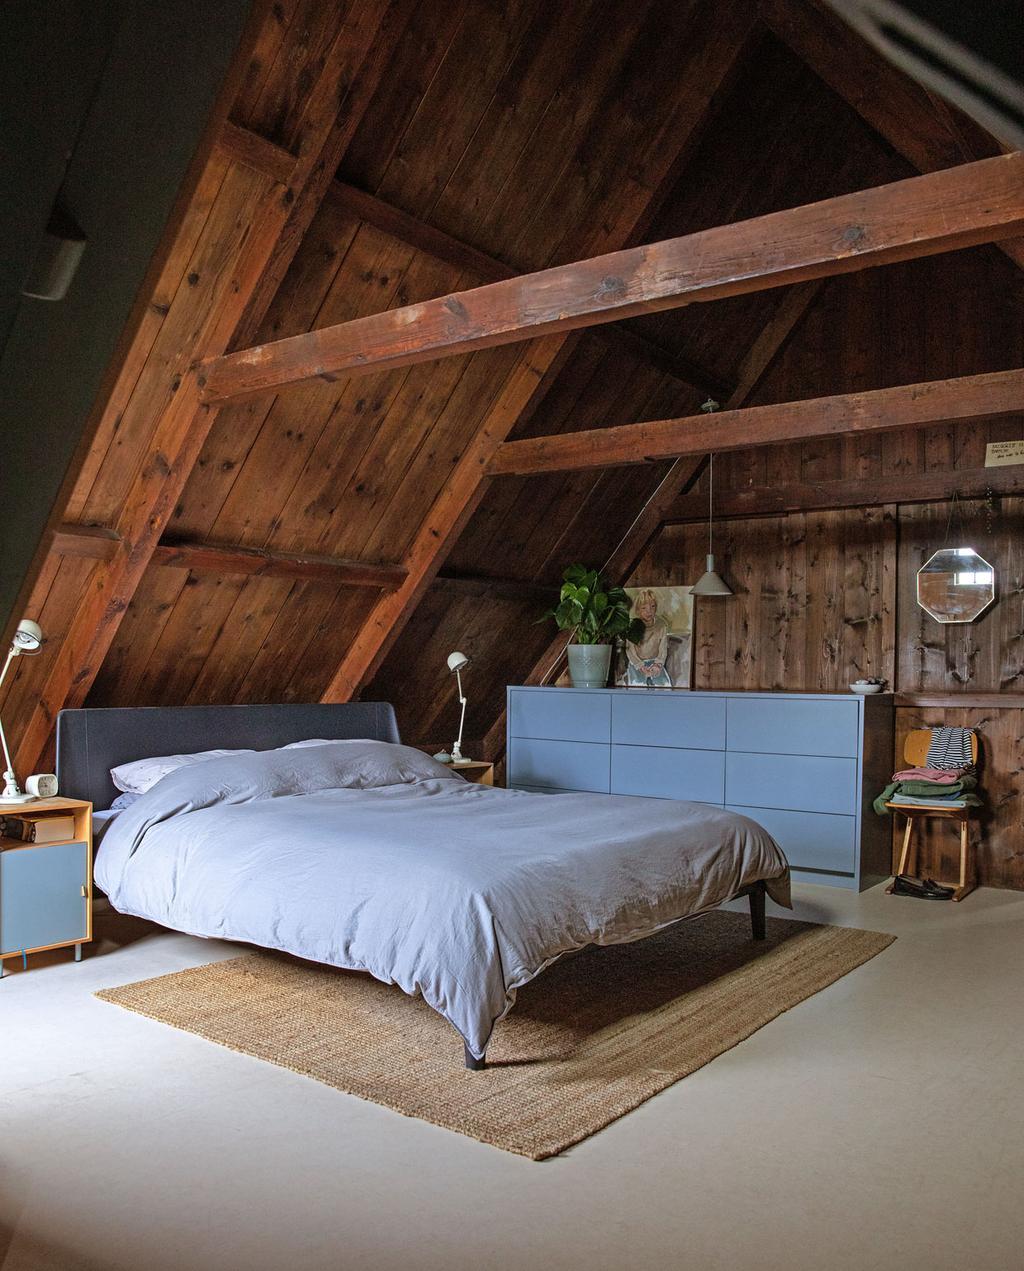 vtwonen 05-2021 | slaapkamer op zolder met Zaanse charme en oude houten balken